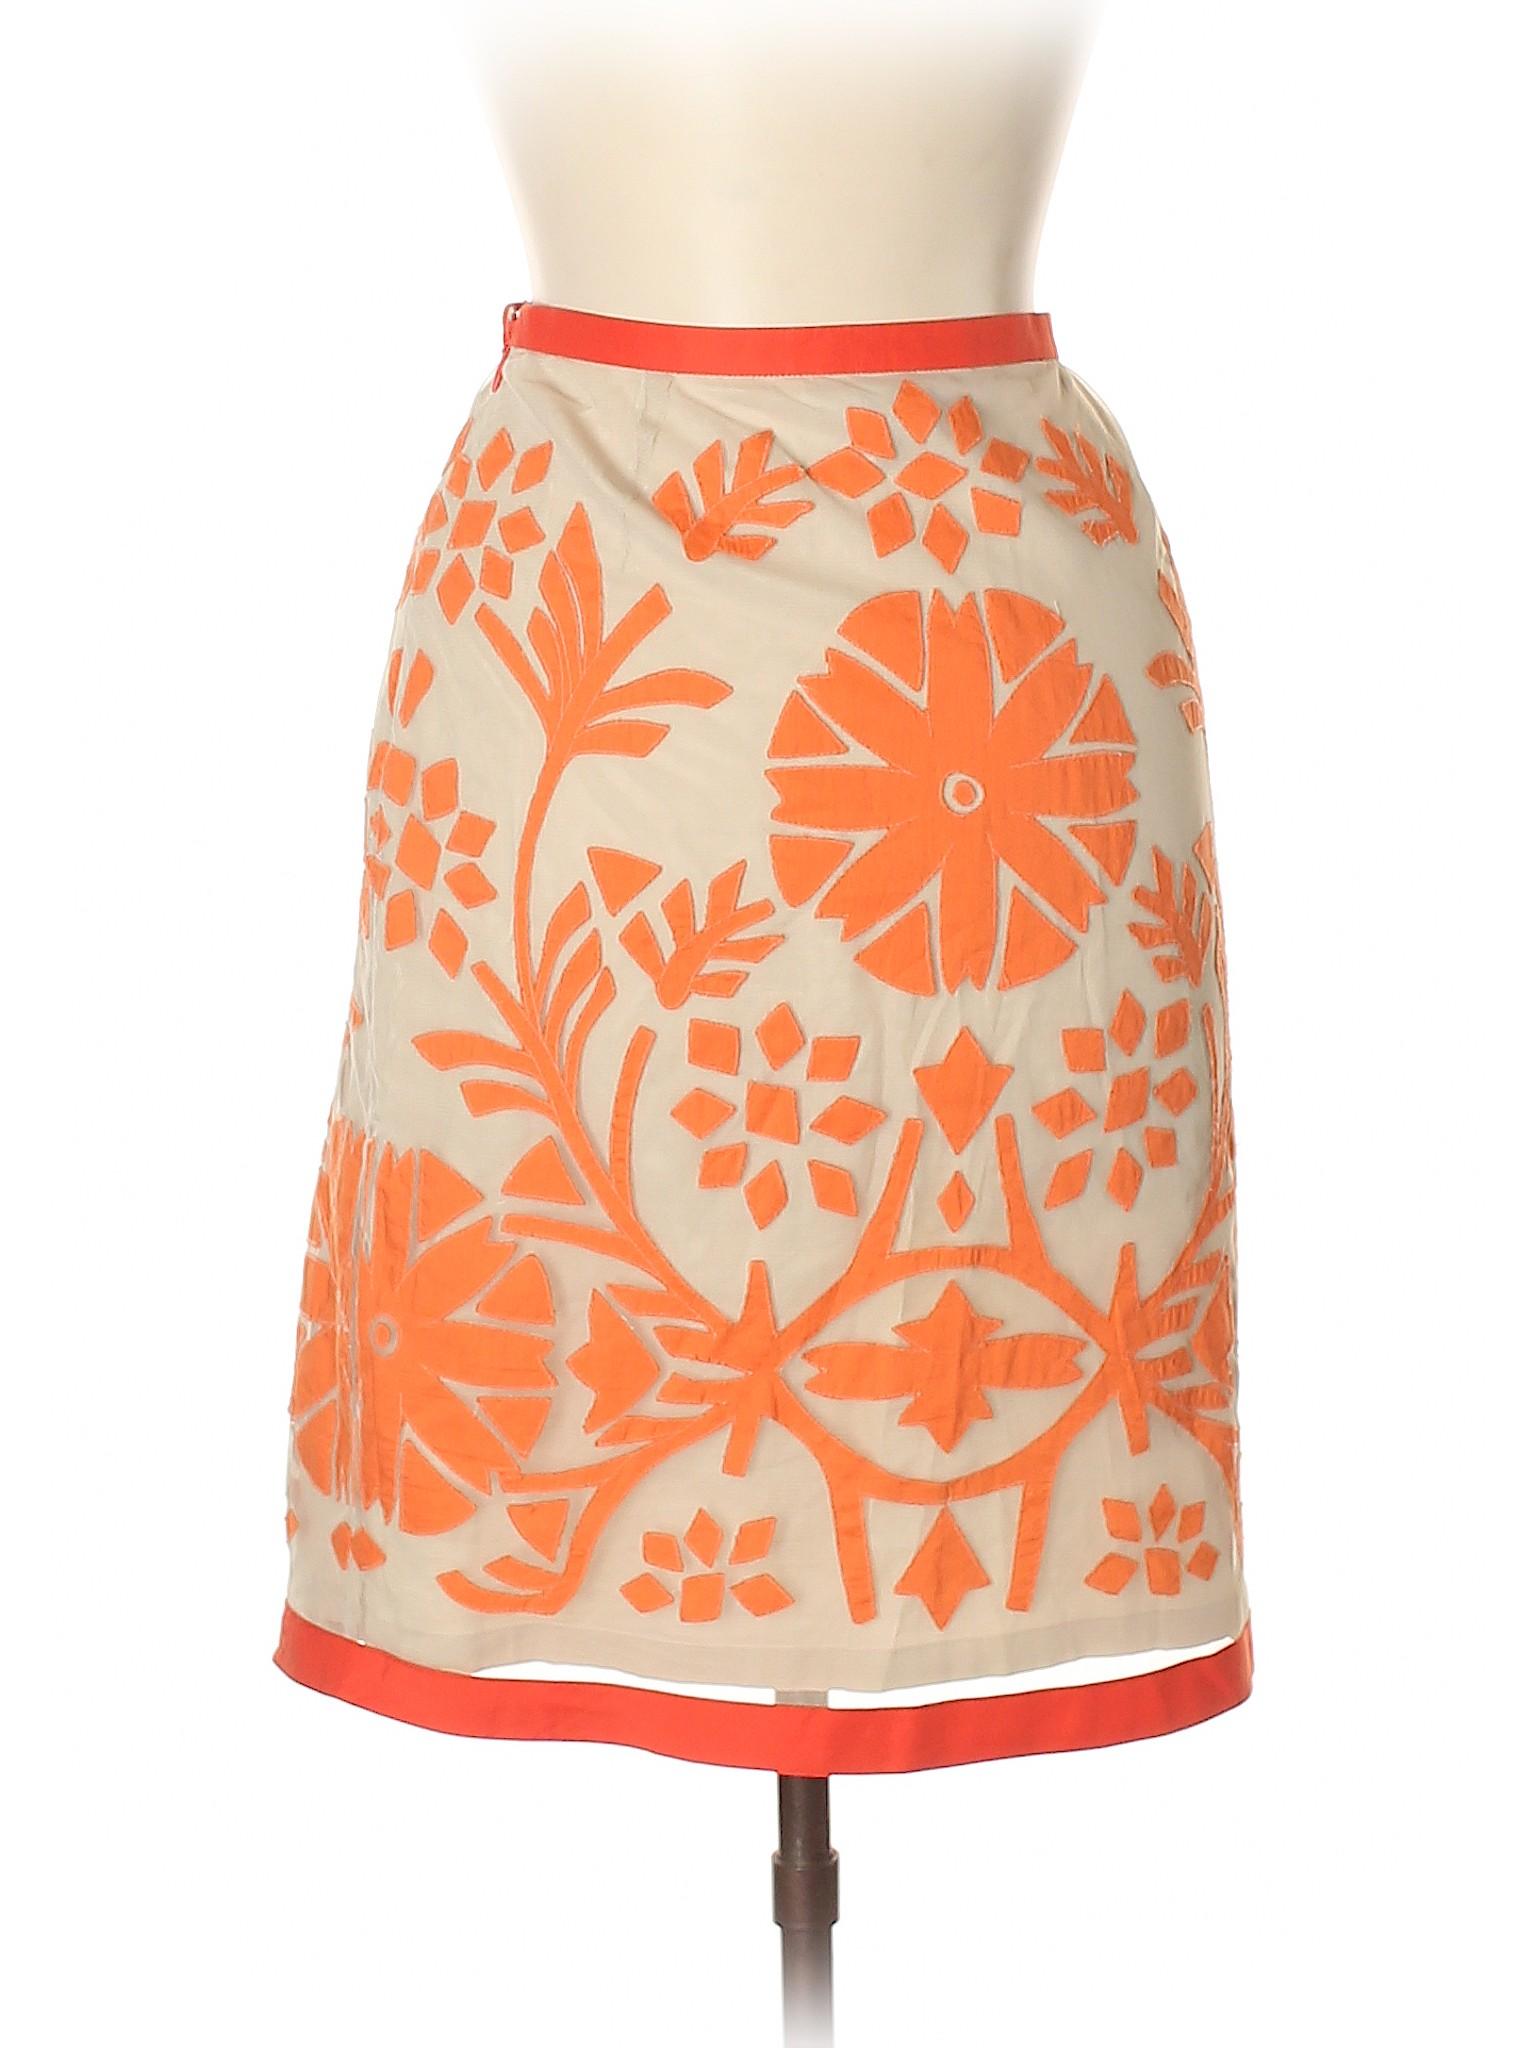 Skirt Skirt Boutique Boutique Boutique Casual Skirt Casual Casual Boutique fE8OEB